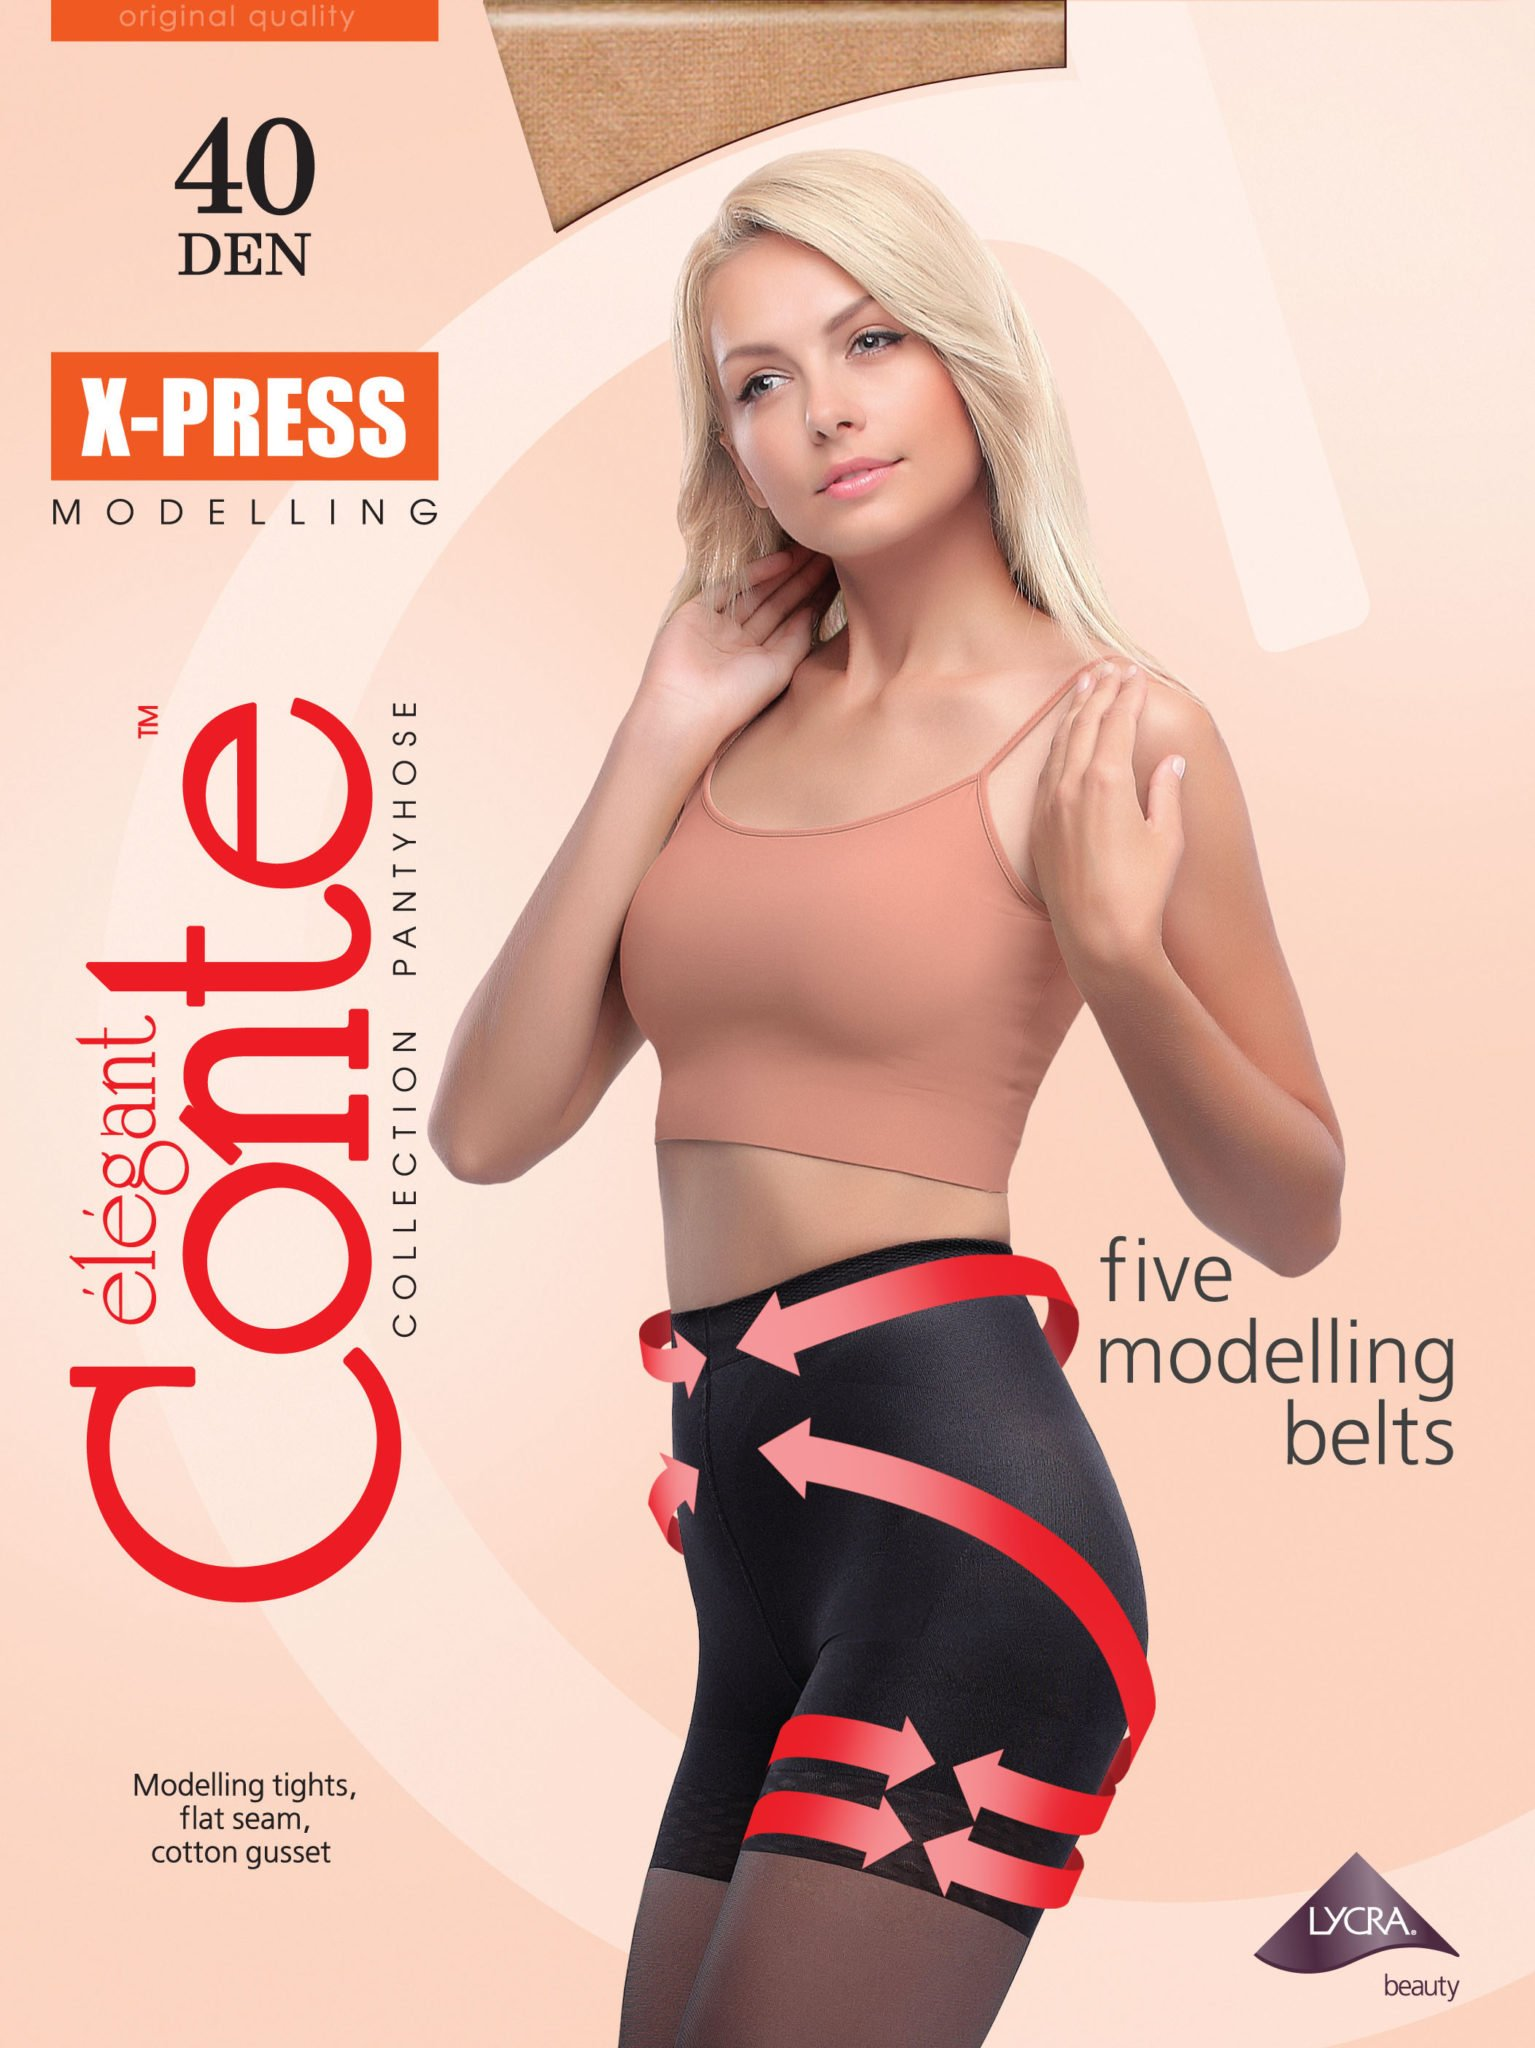 dense modelling body-shaping pantyhose - BellaConte